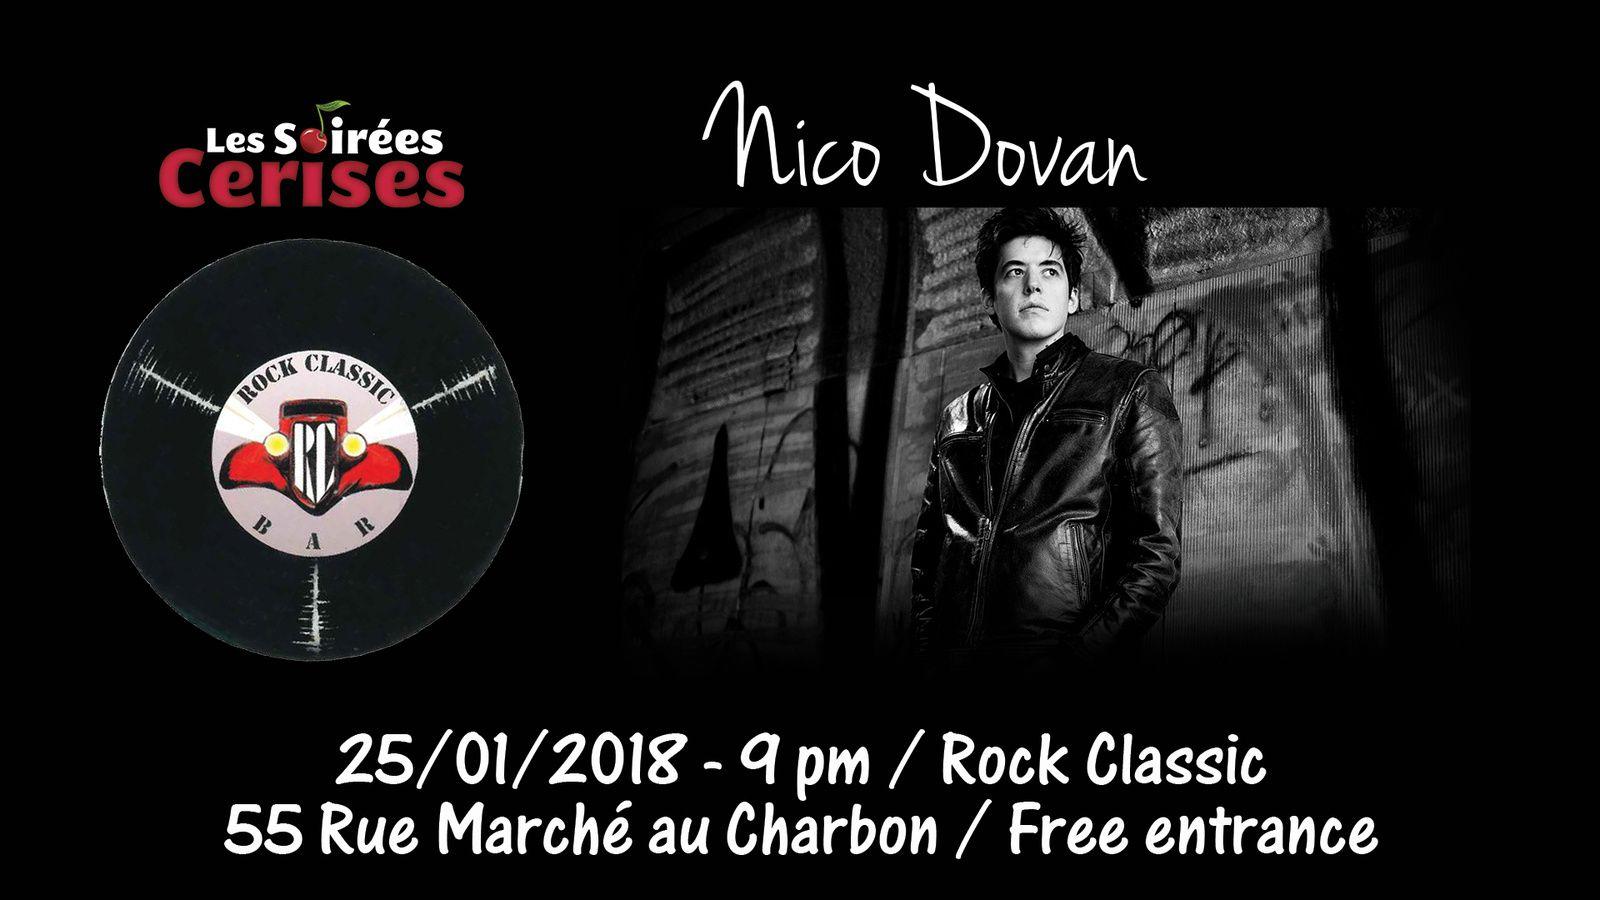 ▶ Nico Dovan @ Rock Classic - 25/01/2018 - 21h00 - Entrée gratuite !